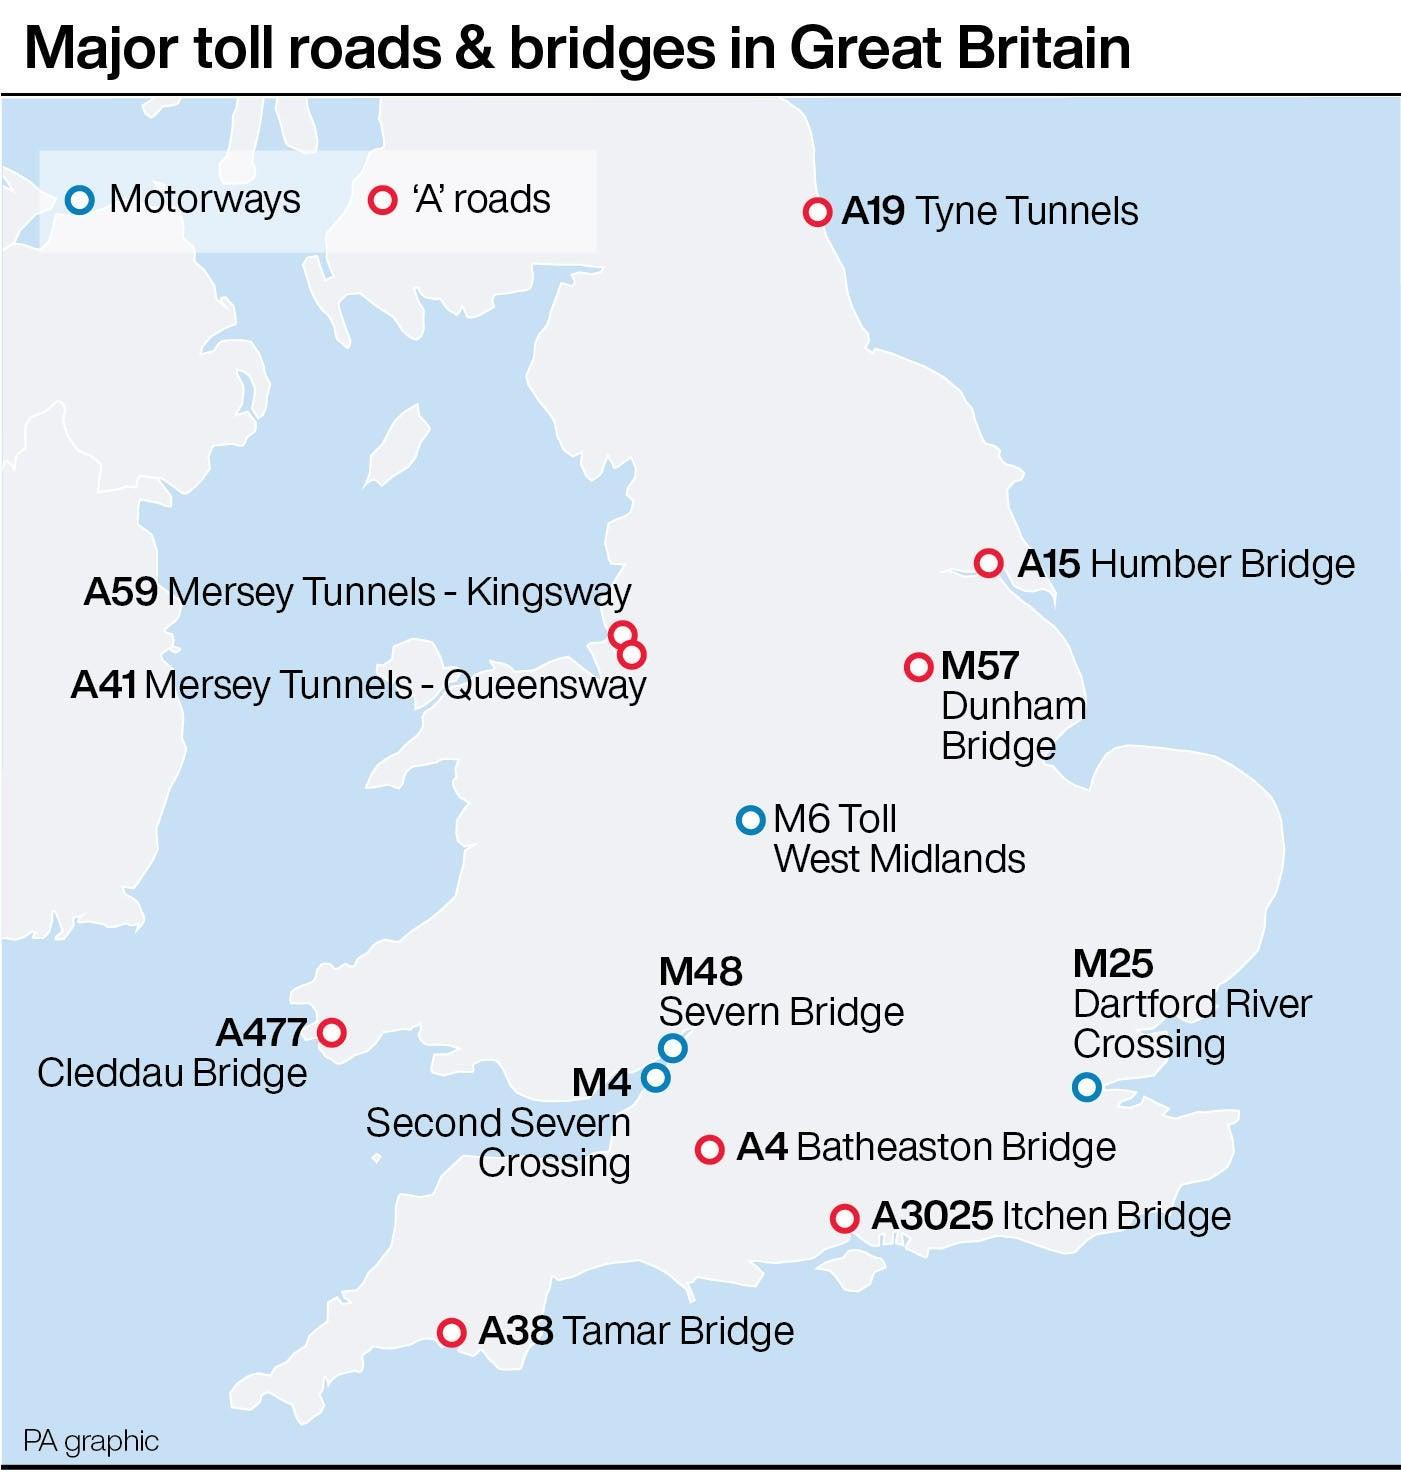 Major toll roads & bridges in Great Britain